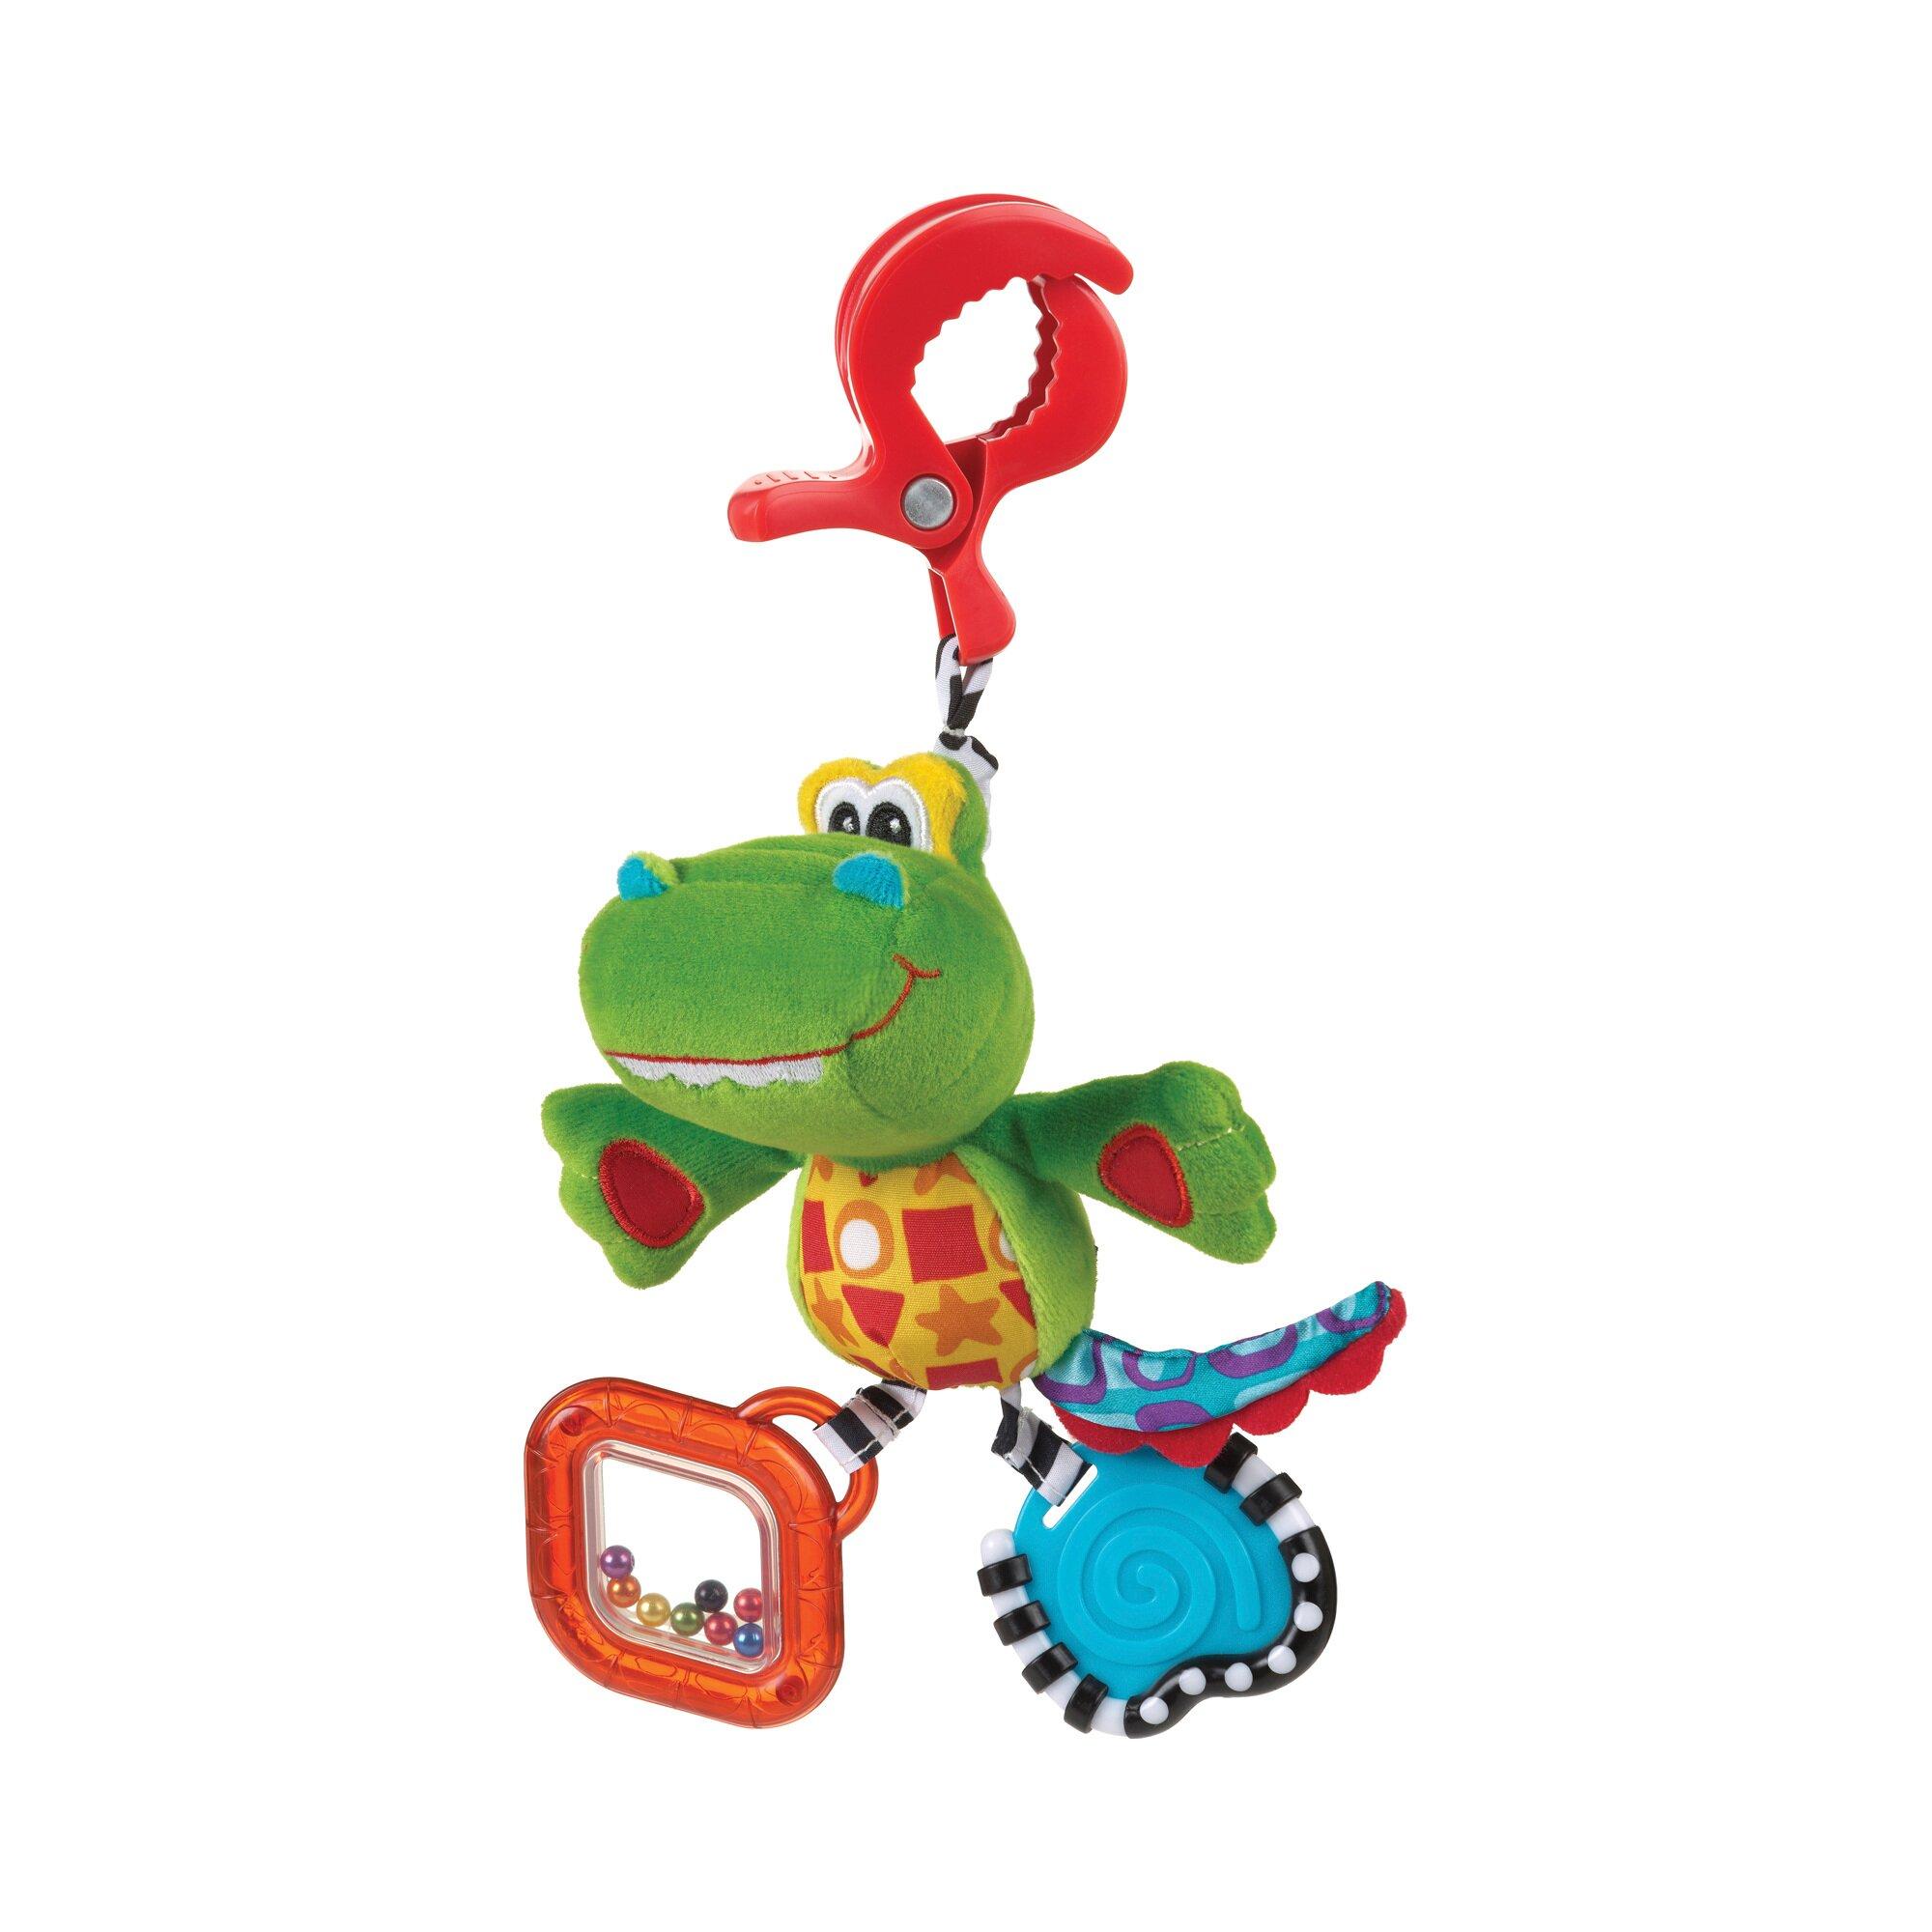 Playgro Kinderwagenkette Snappy das Krokodil gruen